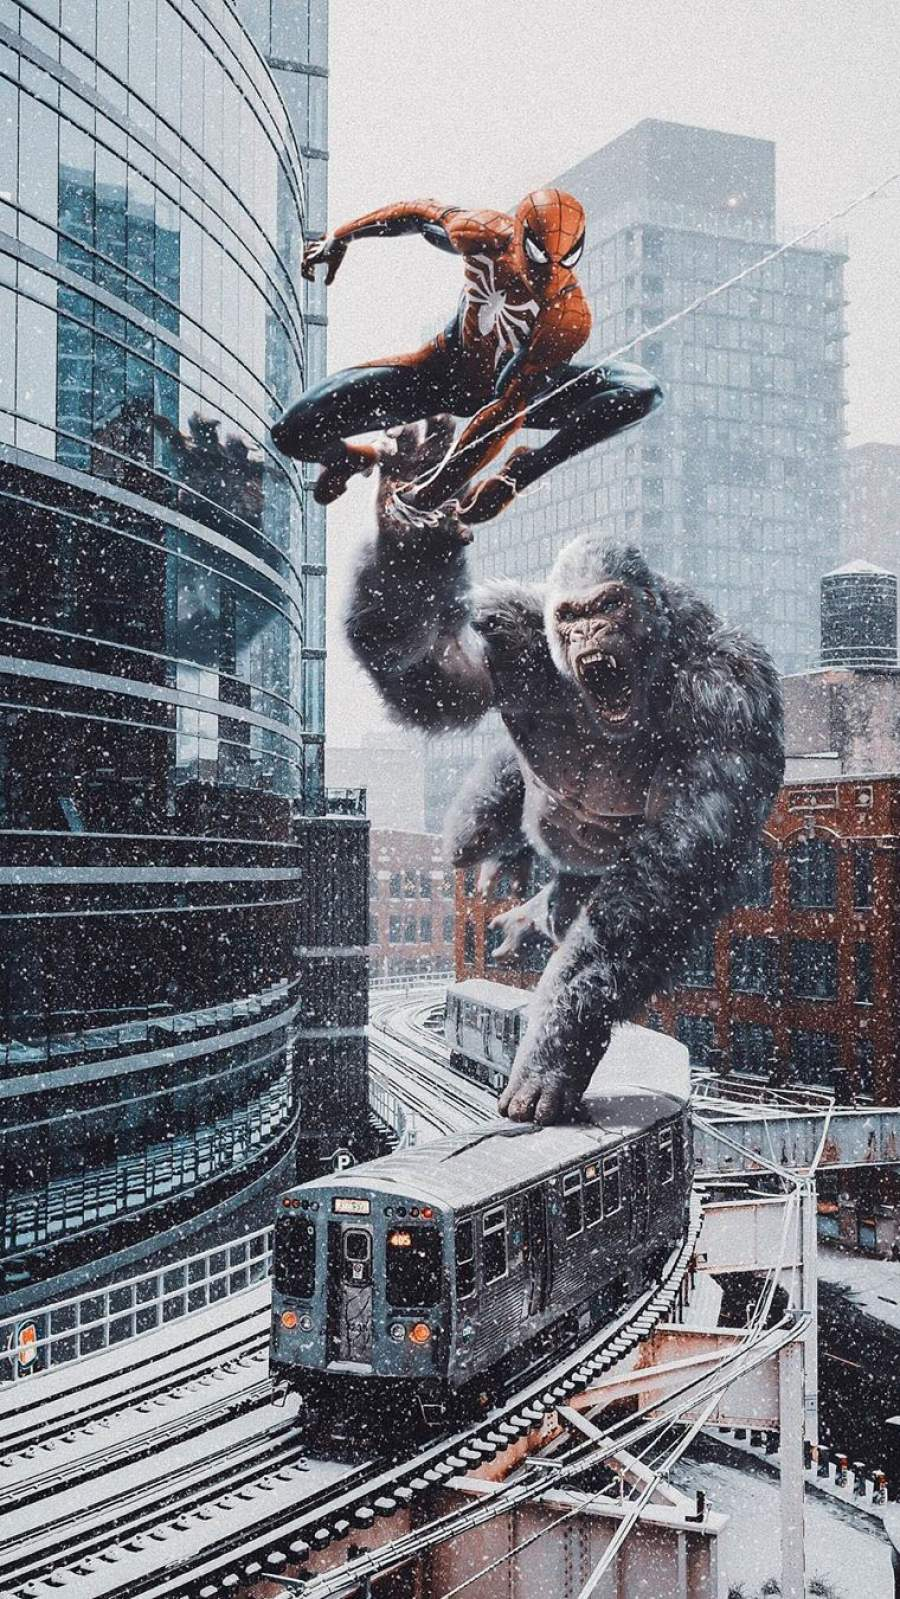 Spiderman vs King Kong iPhone Wallpaper